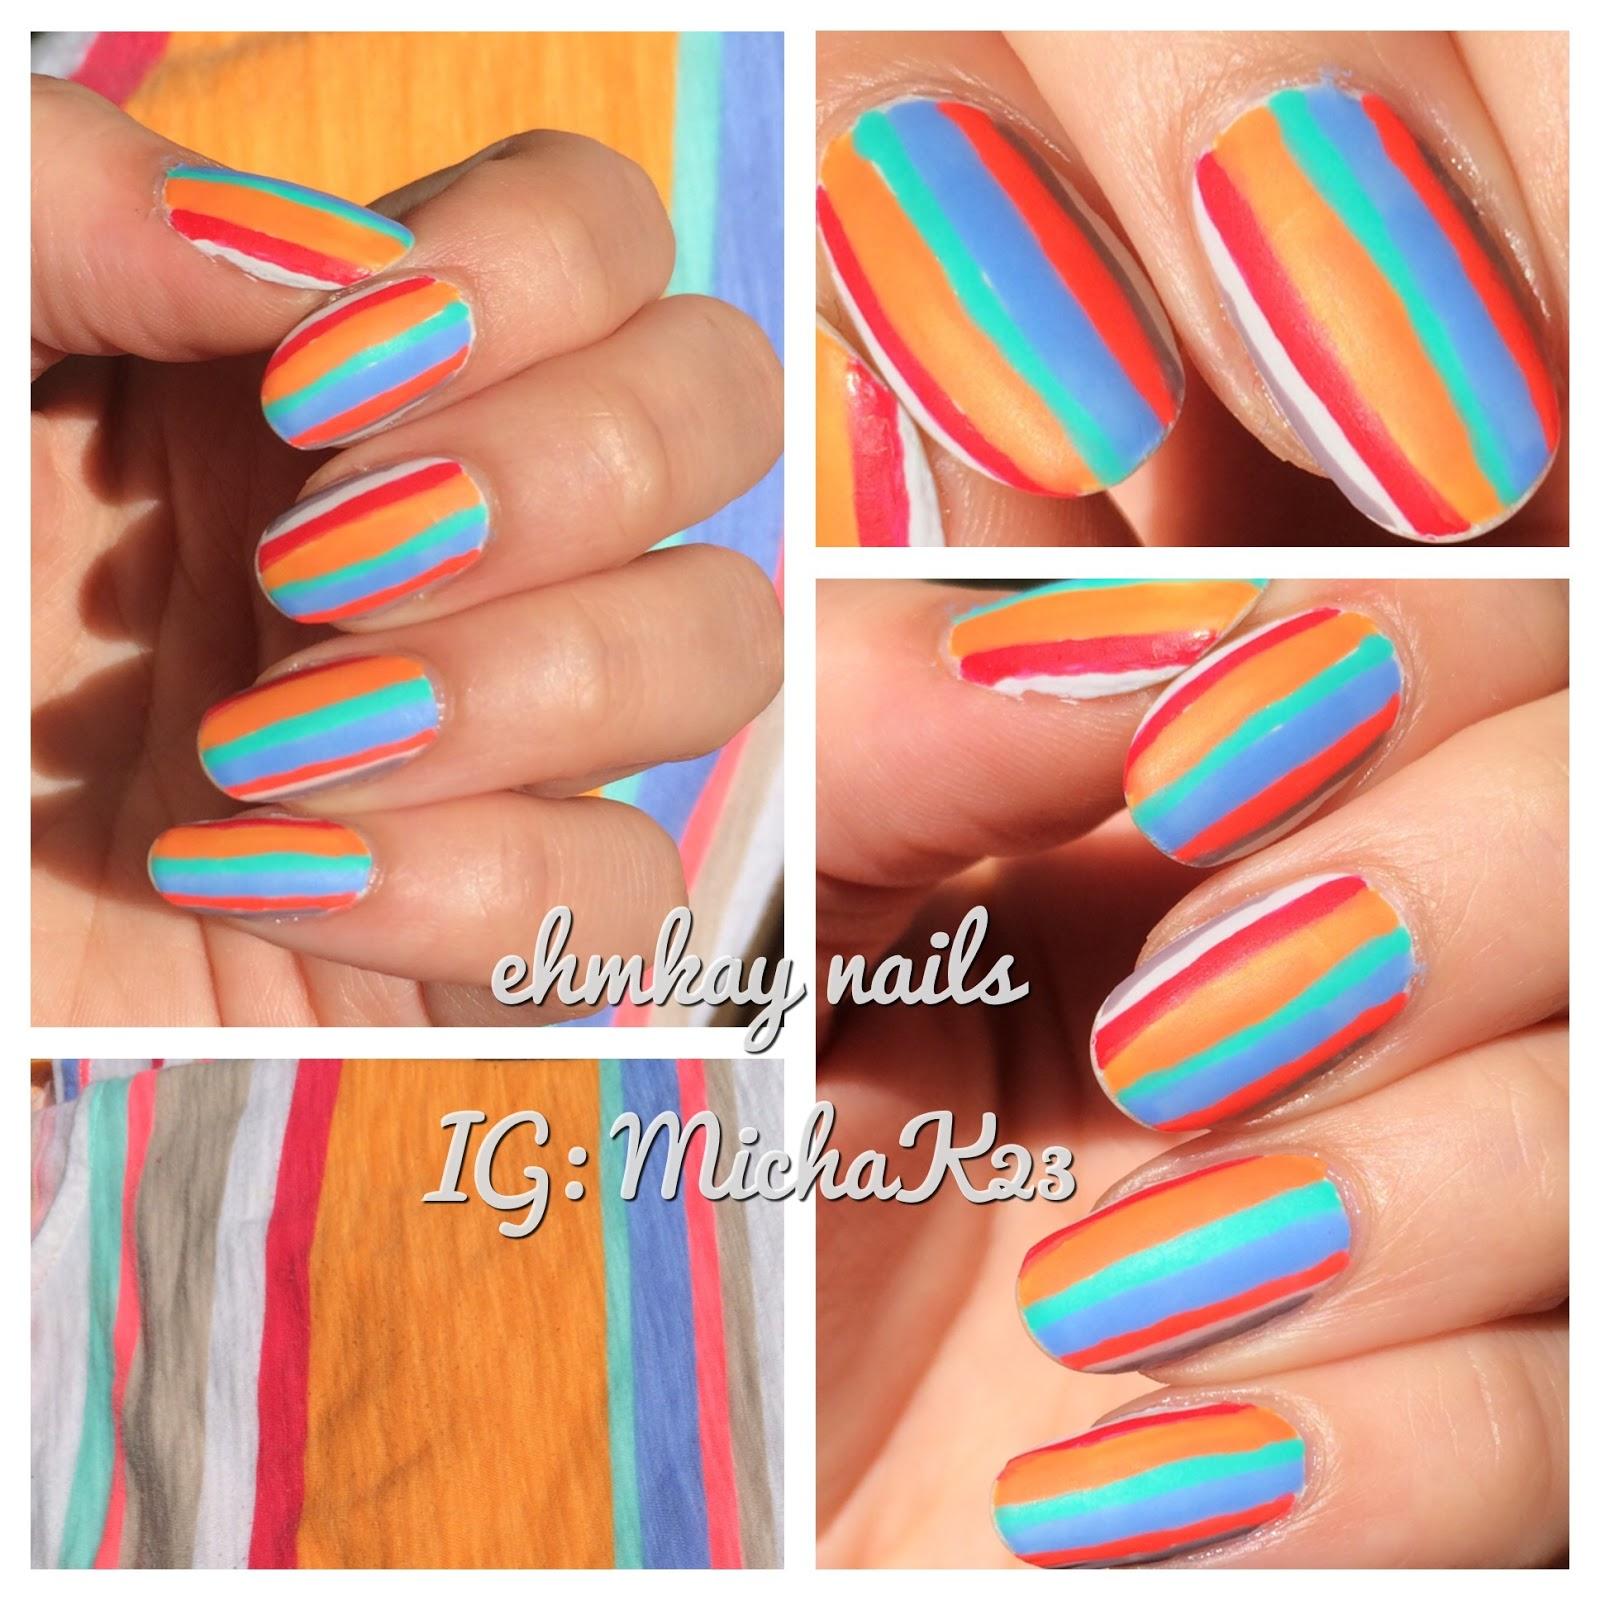 ehmkay nails: Clothing Inspiration: Neon Matte Stripes Nail Art